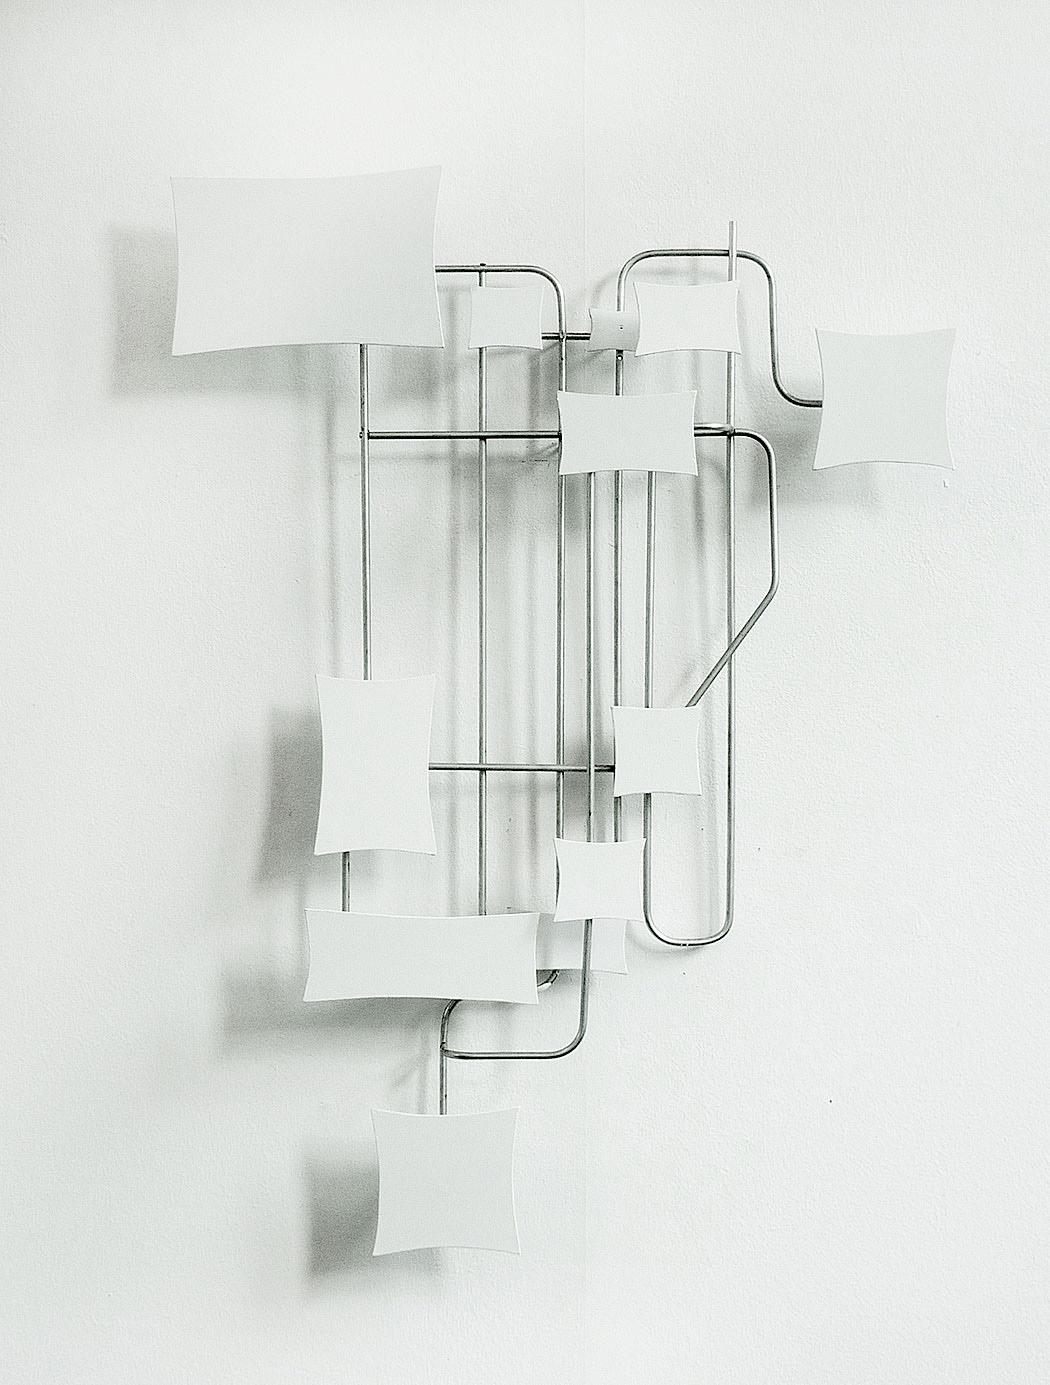 o.T. 2013; 83 x 60 cm